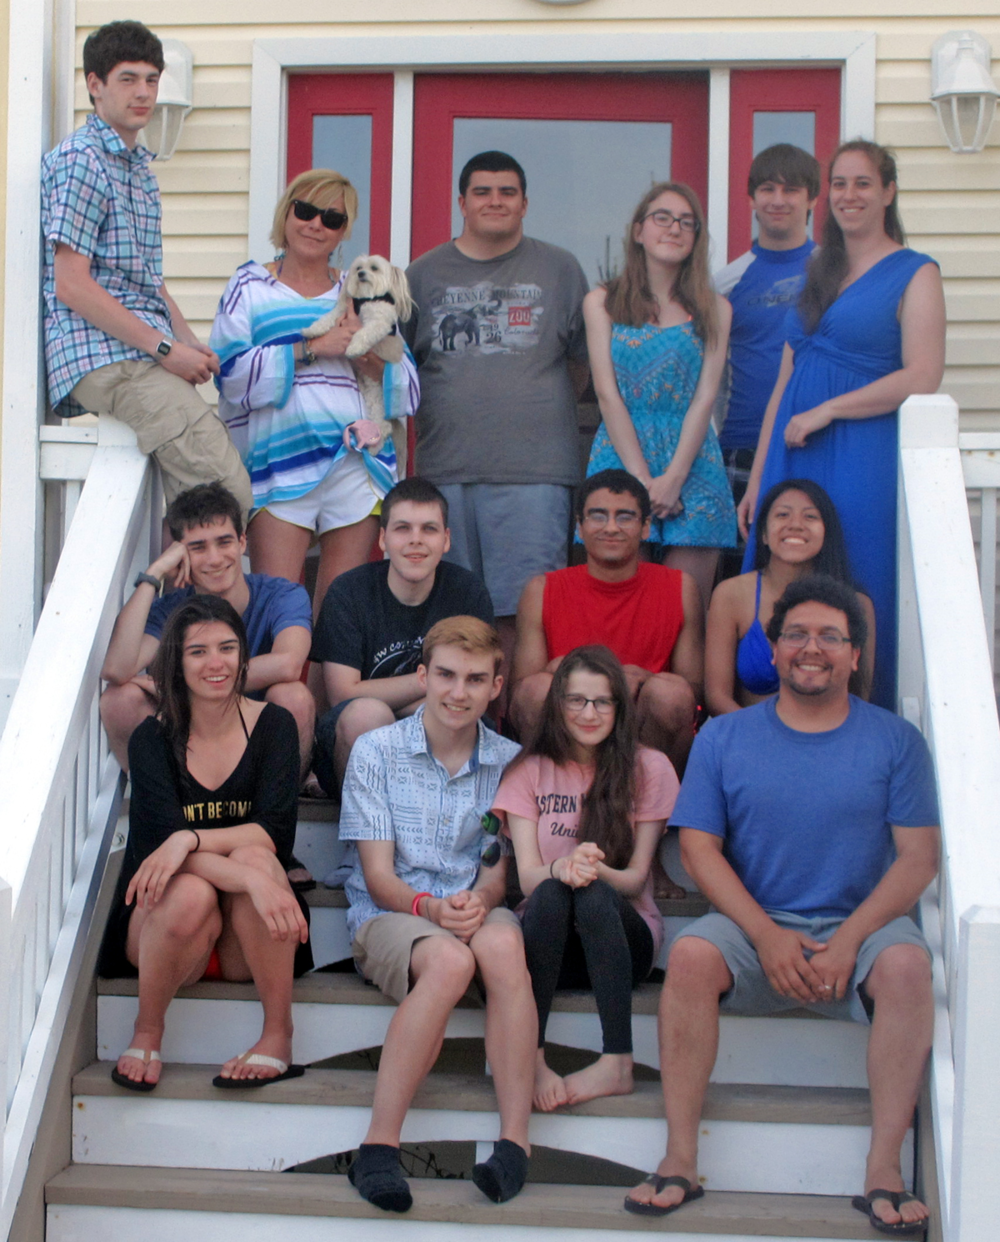 Seniors Beach Trip in Corolla, NC- May 2015